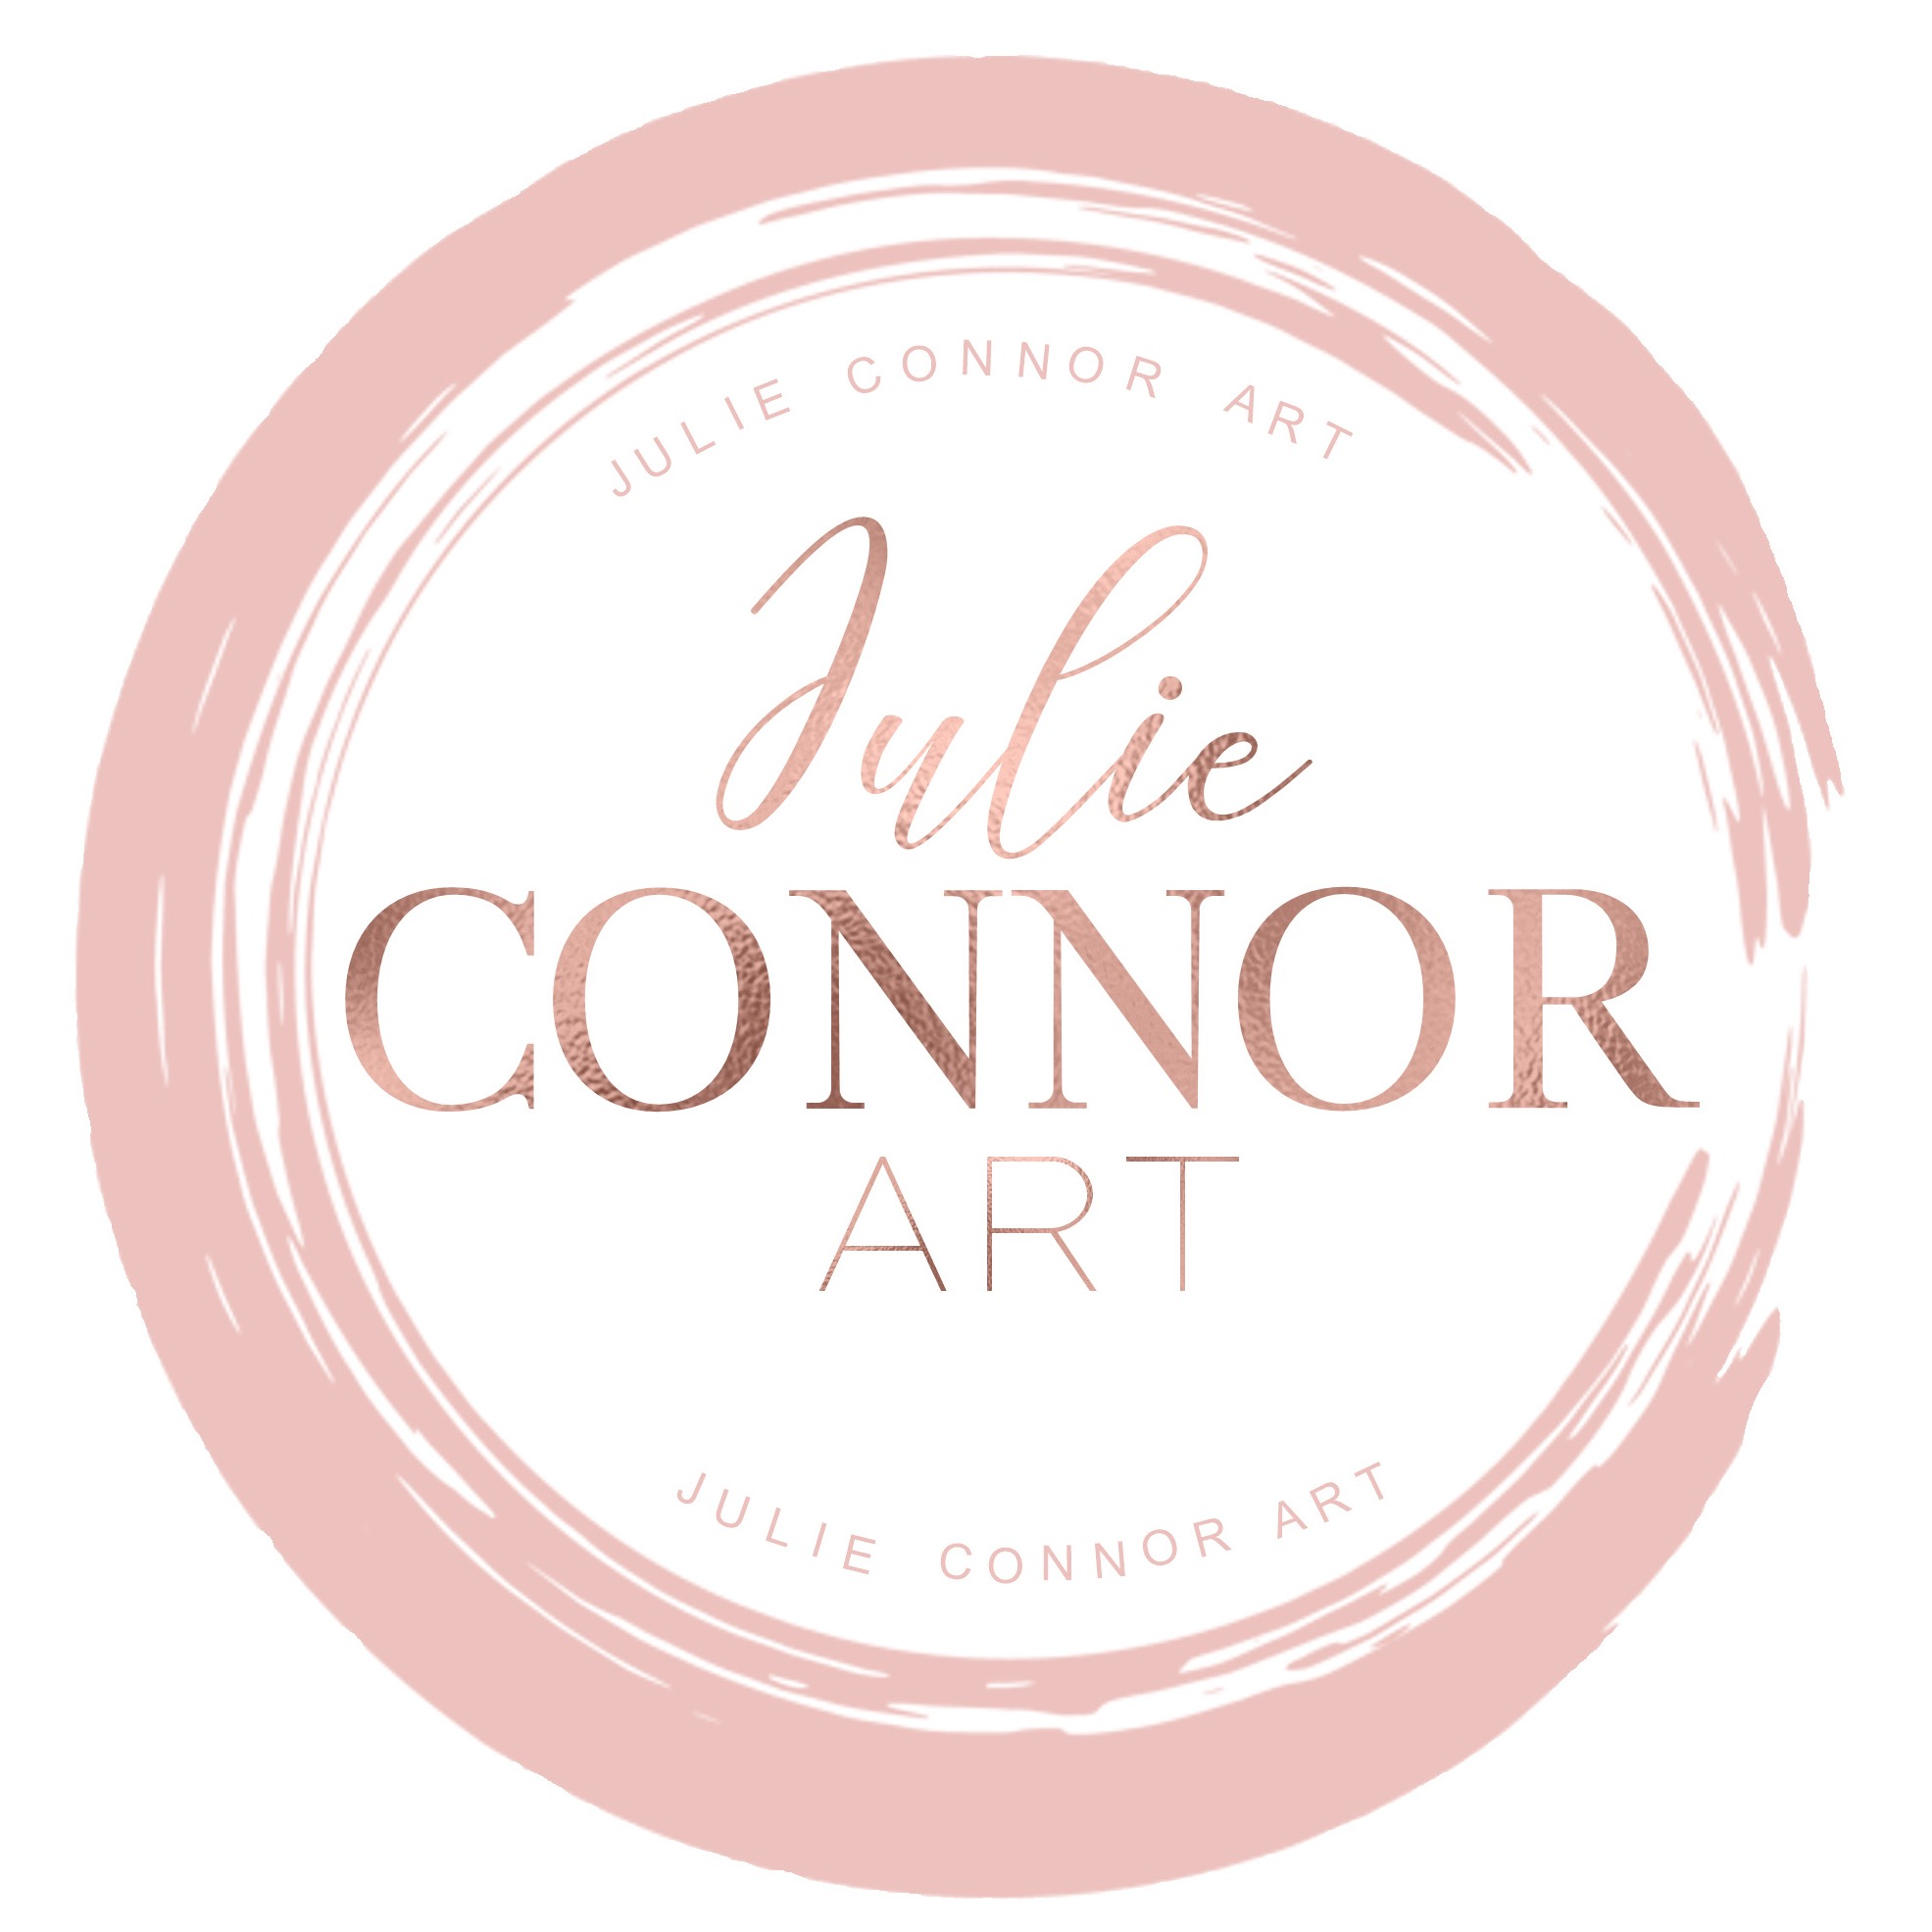 Julie Connor Art (julieconnorart) Profile Image | Linktree